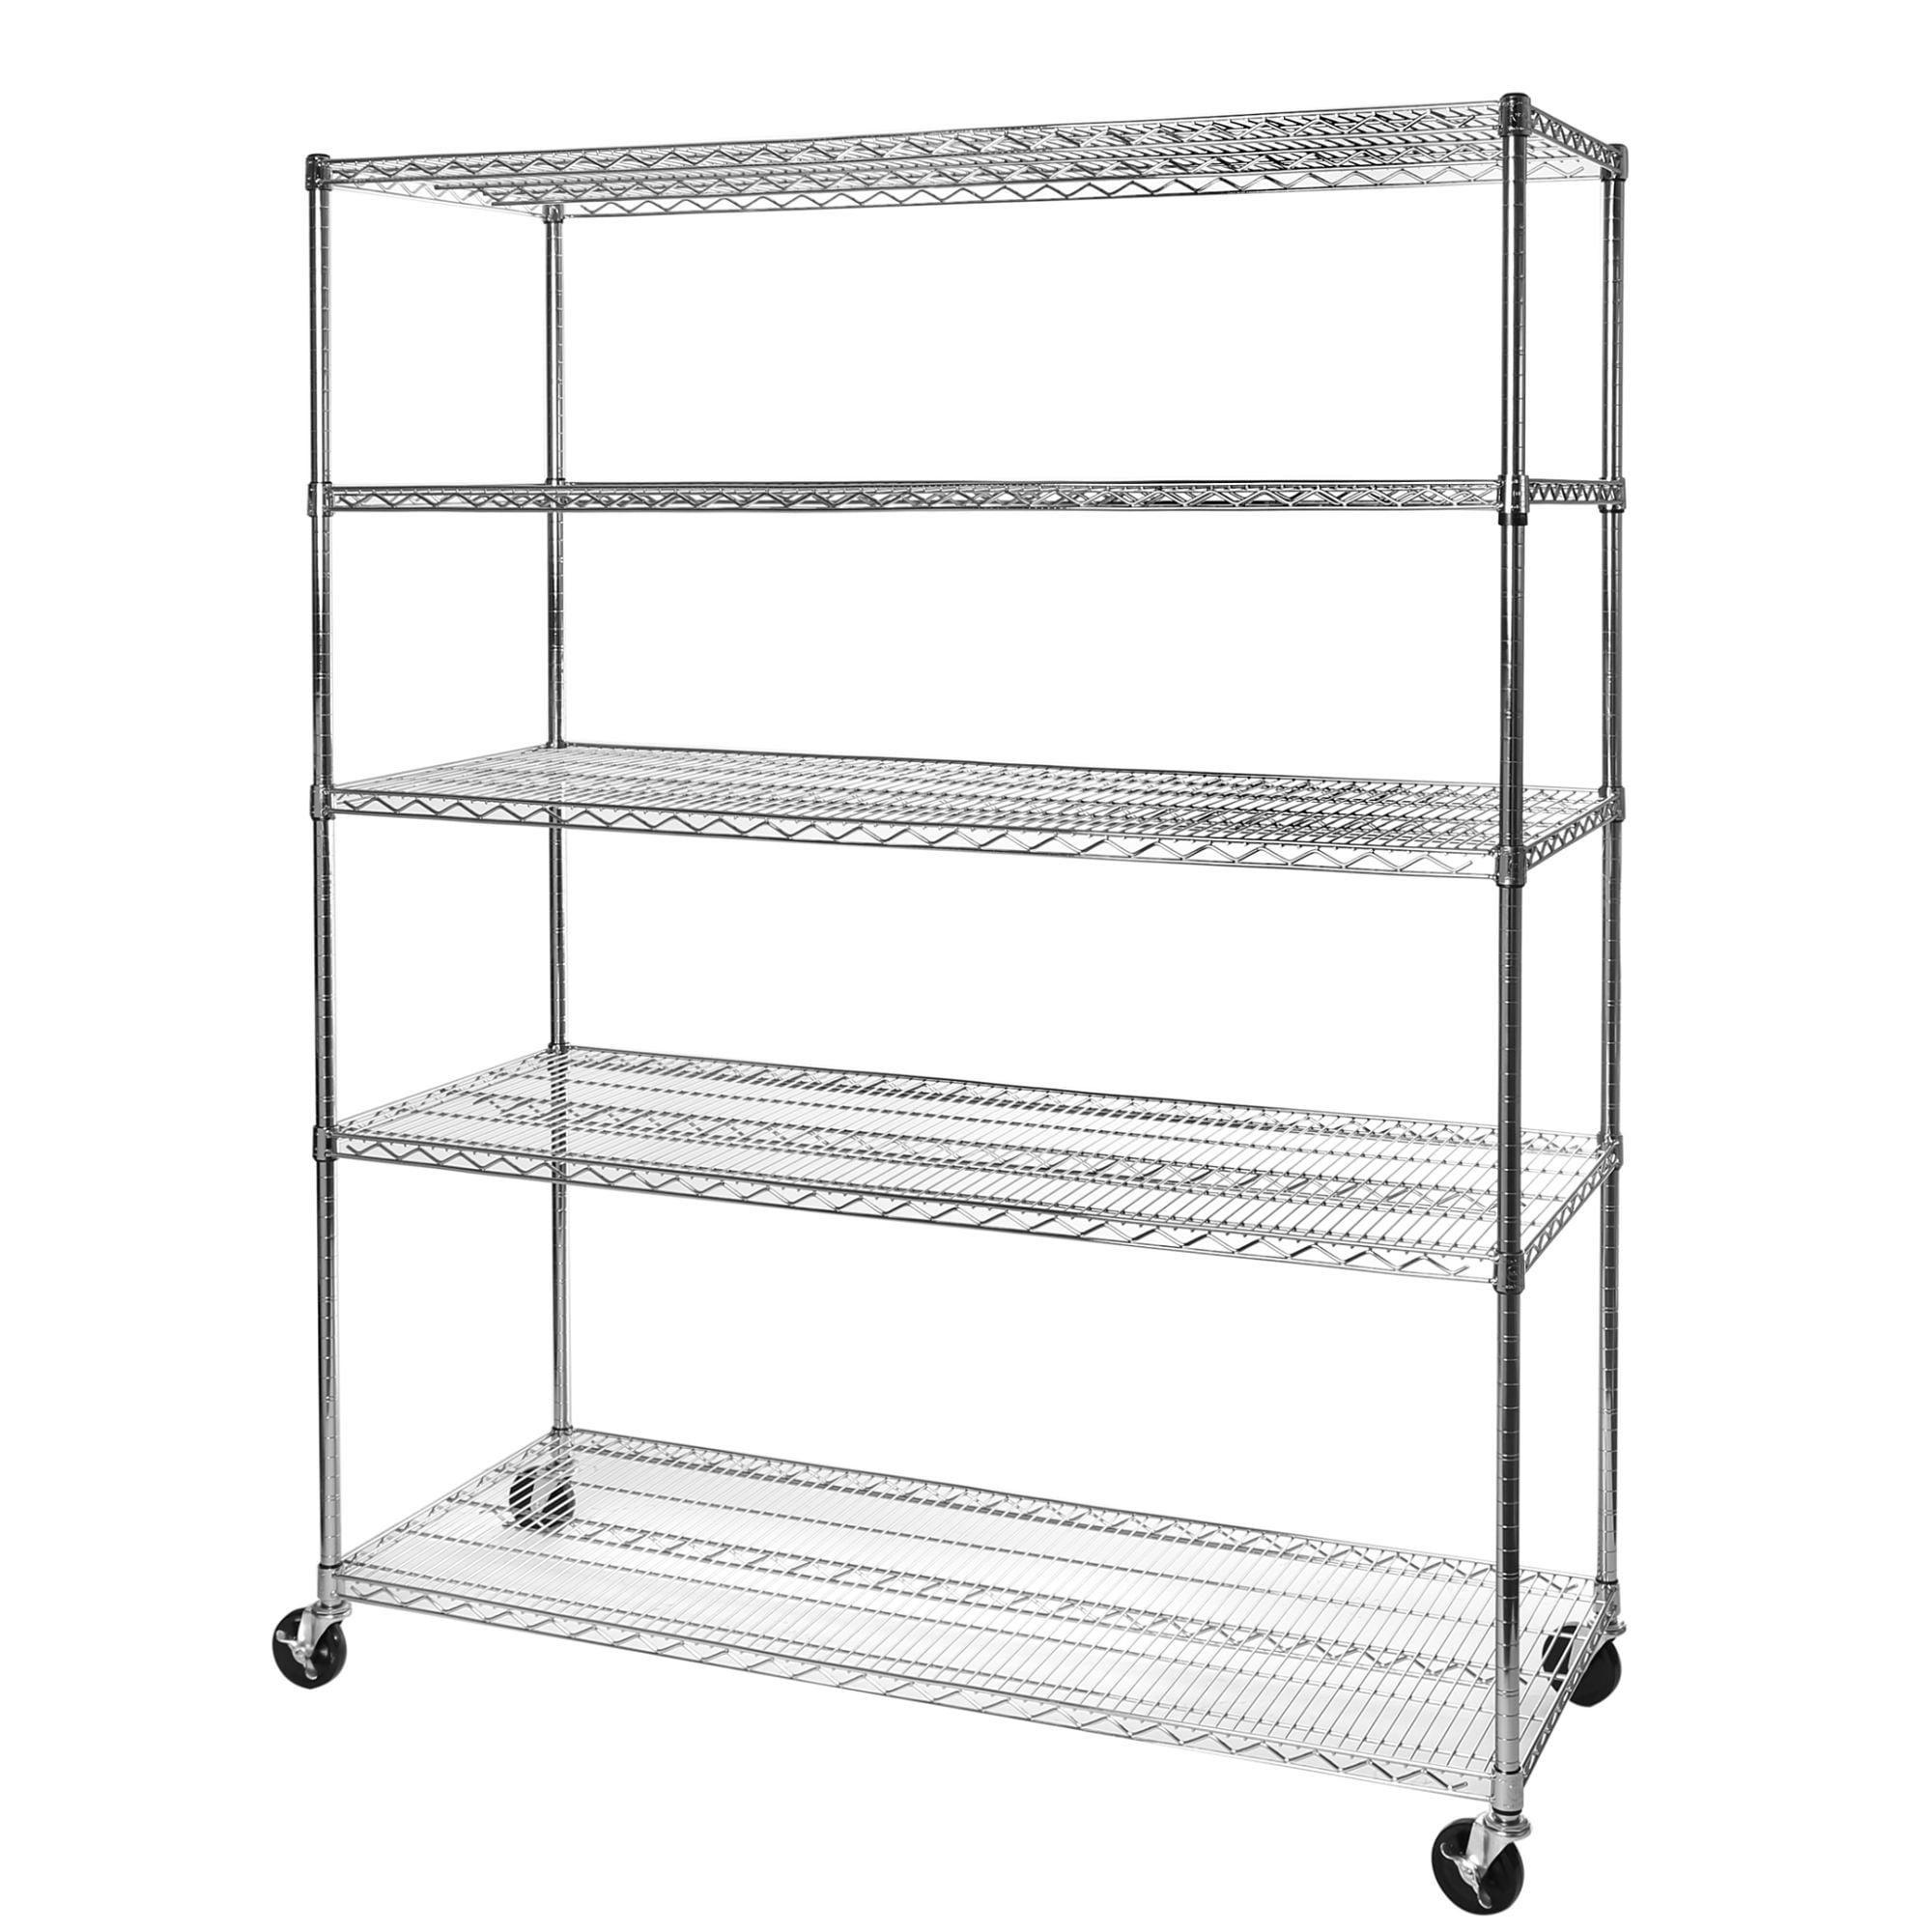 Commercial Chrome Wire Unit 18 x 60-2 Shelf Unit 18 Height